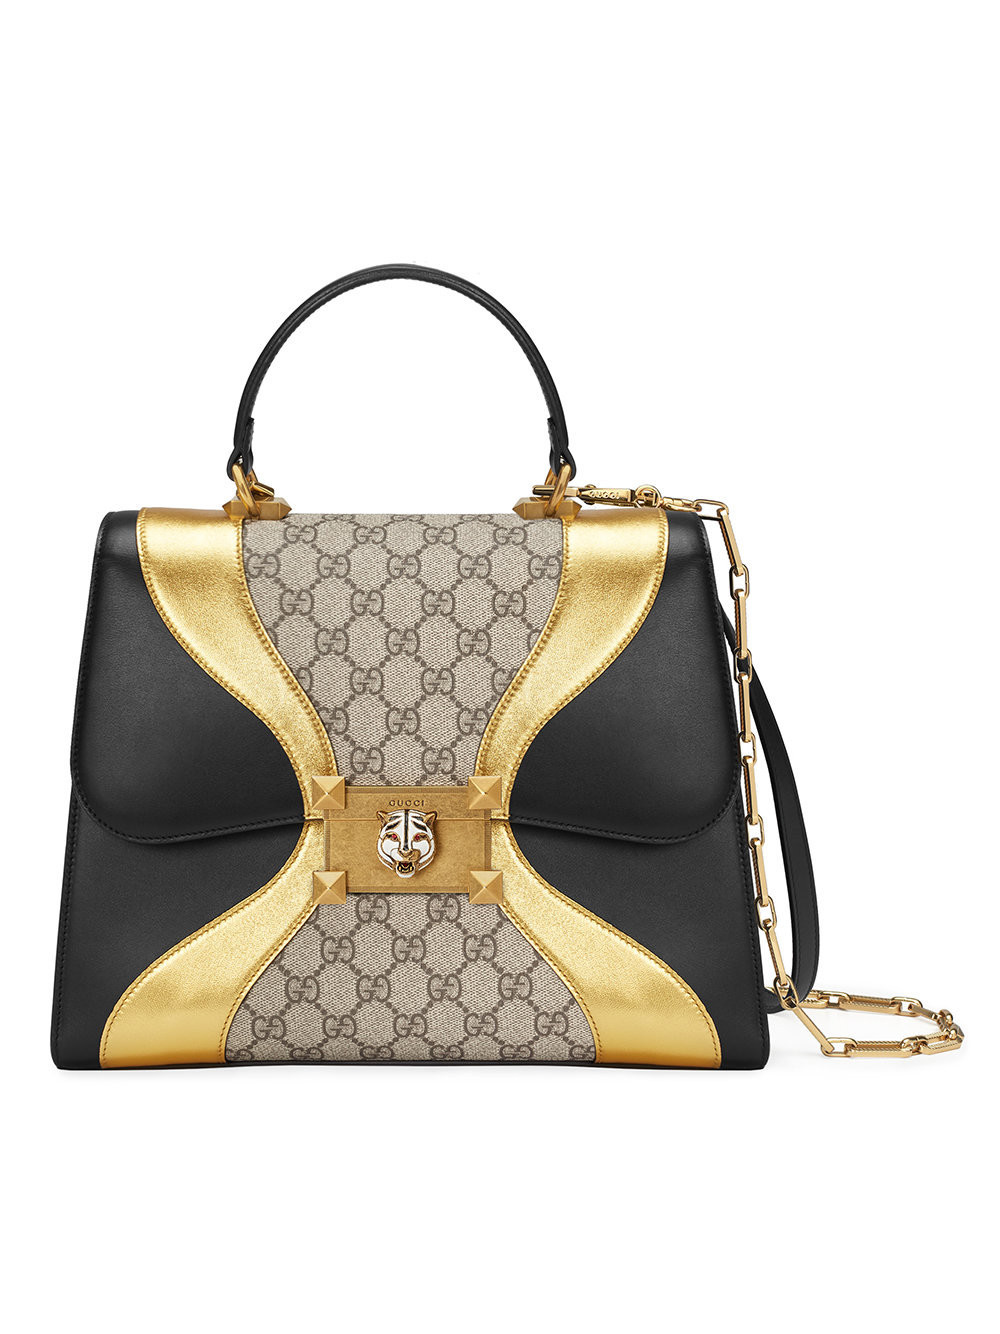 Gucci Medium GG Marmont 2.0 Matelassé Leather Shoulder Bag   Nordstrom